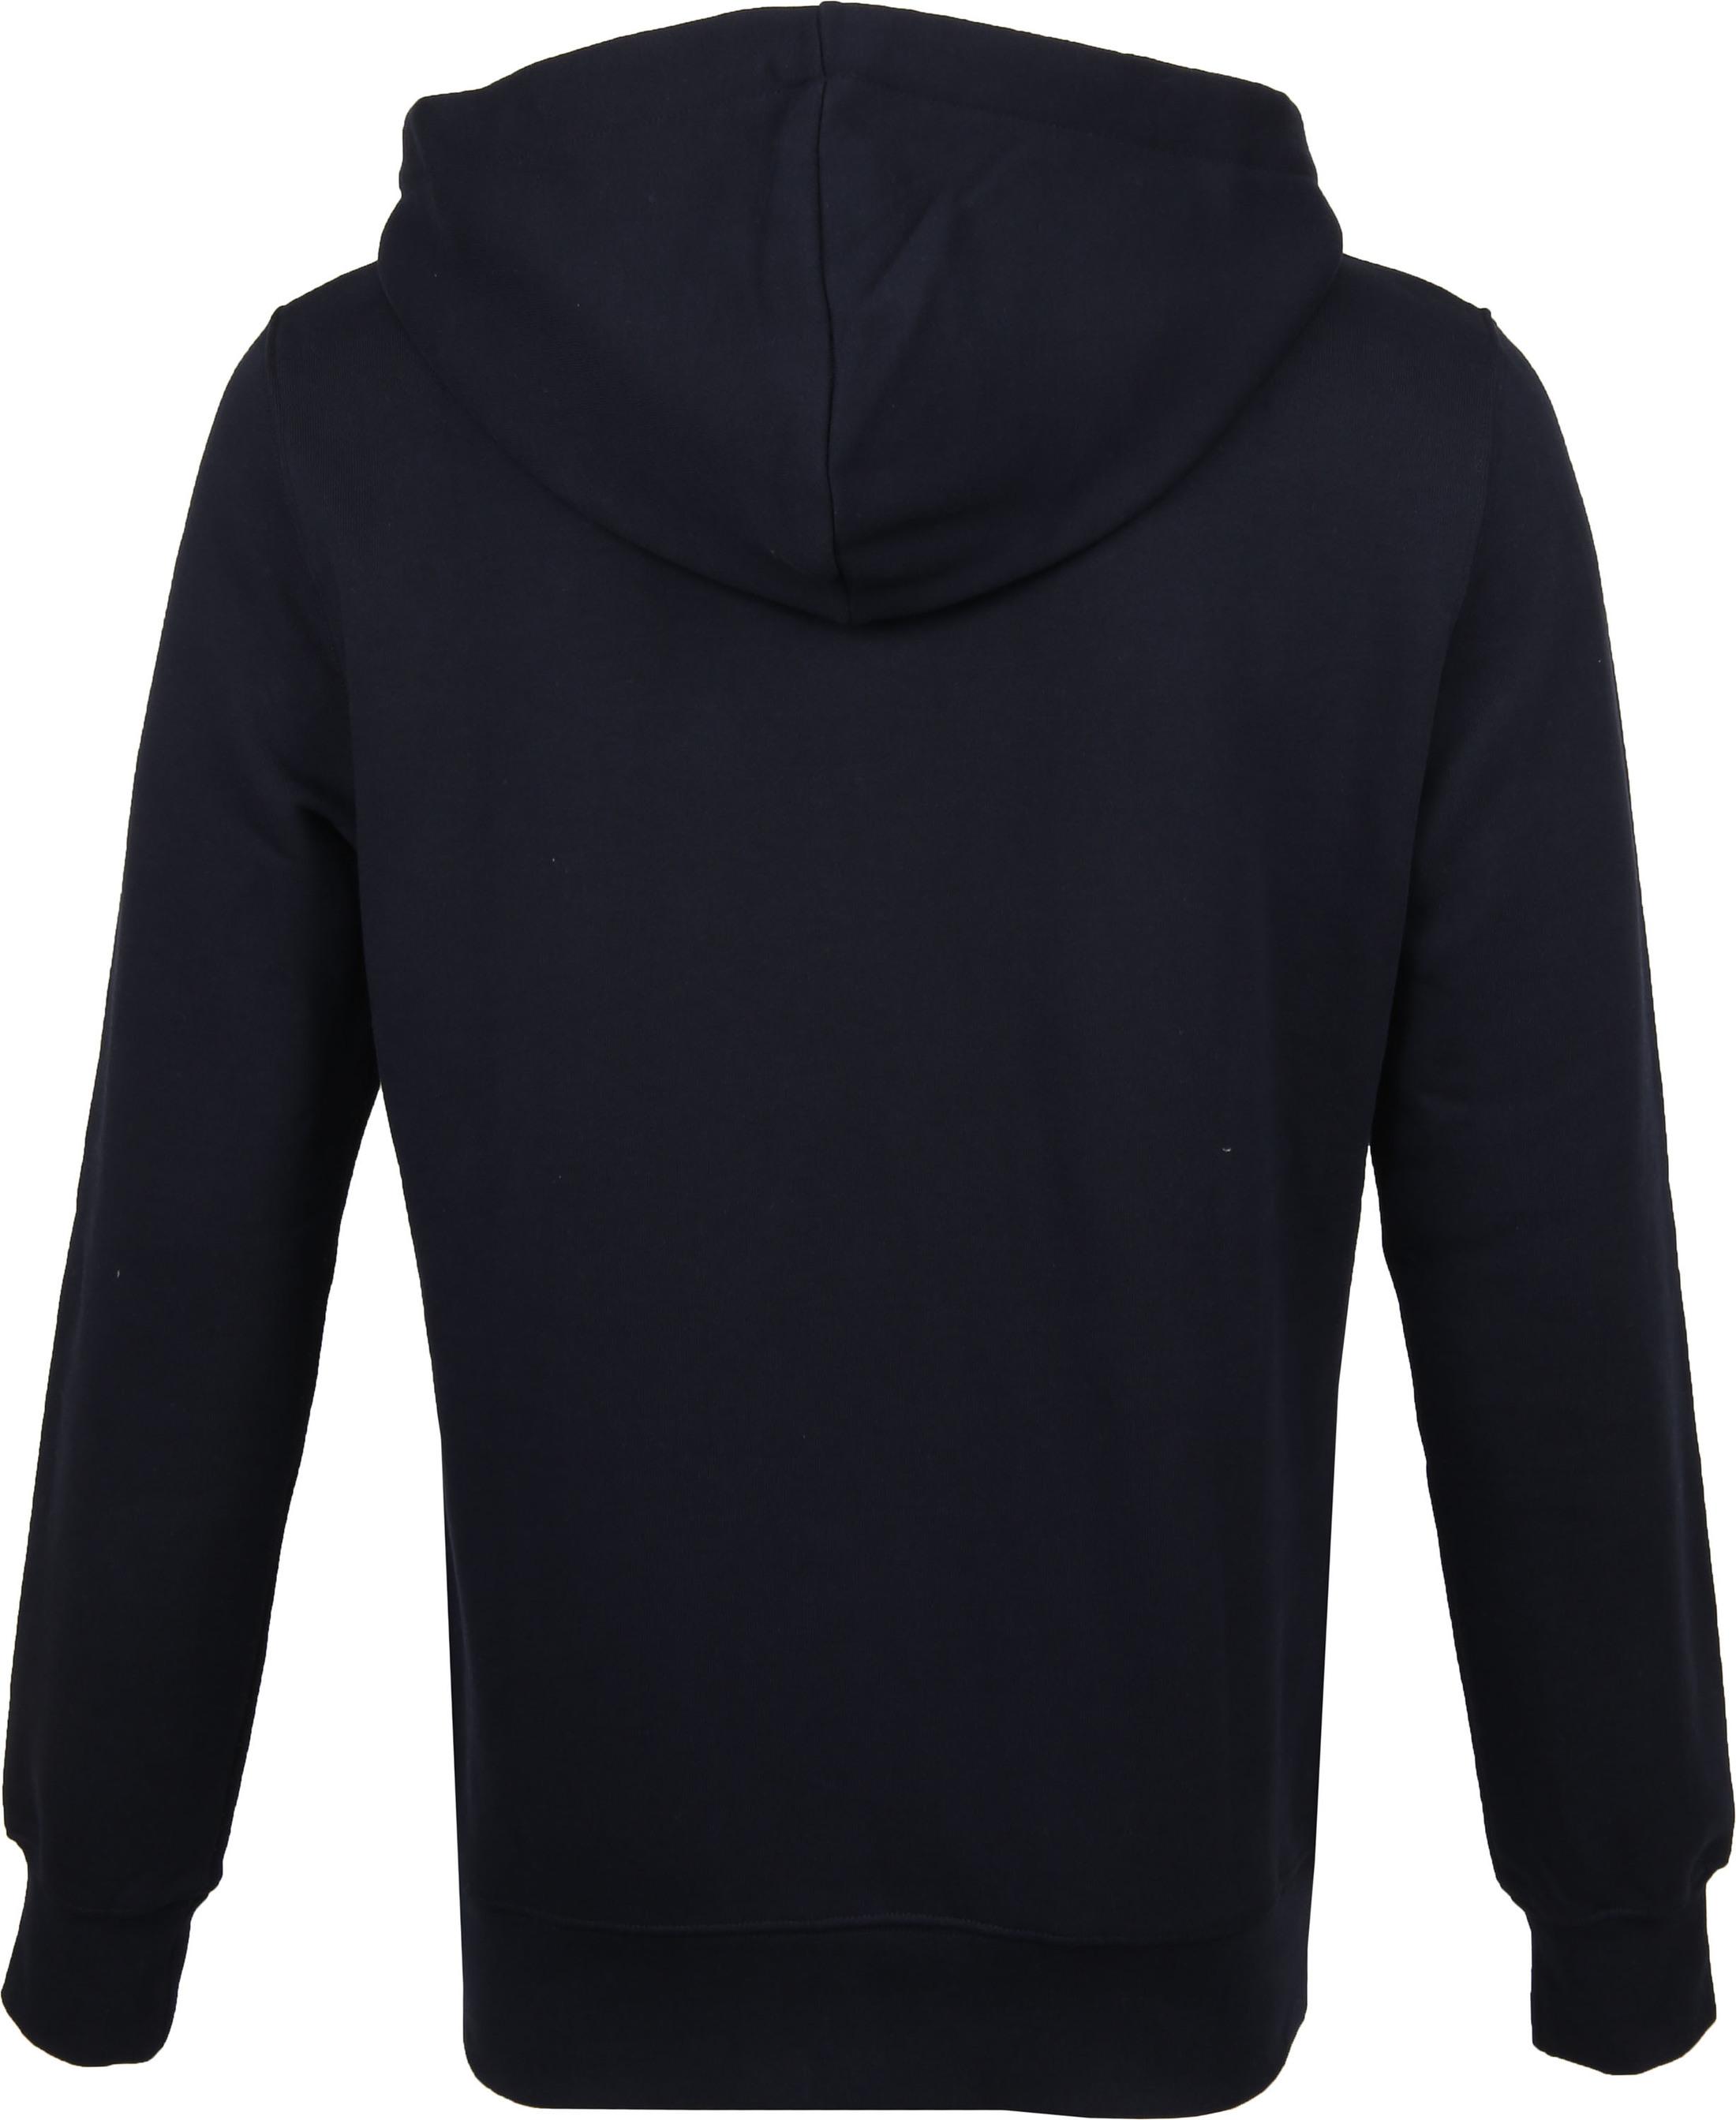 Bjorn Borg Vest Donkerblauw - Donkerblauw maat S